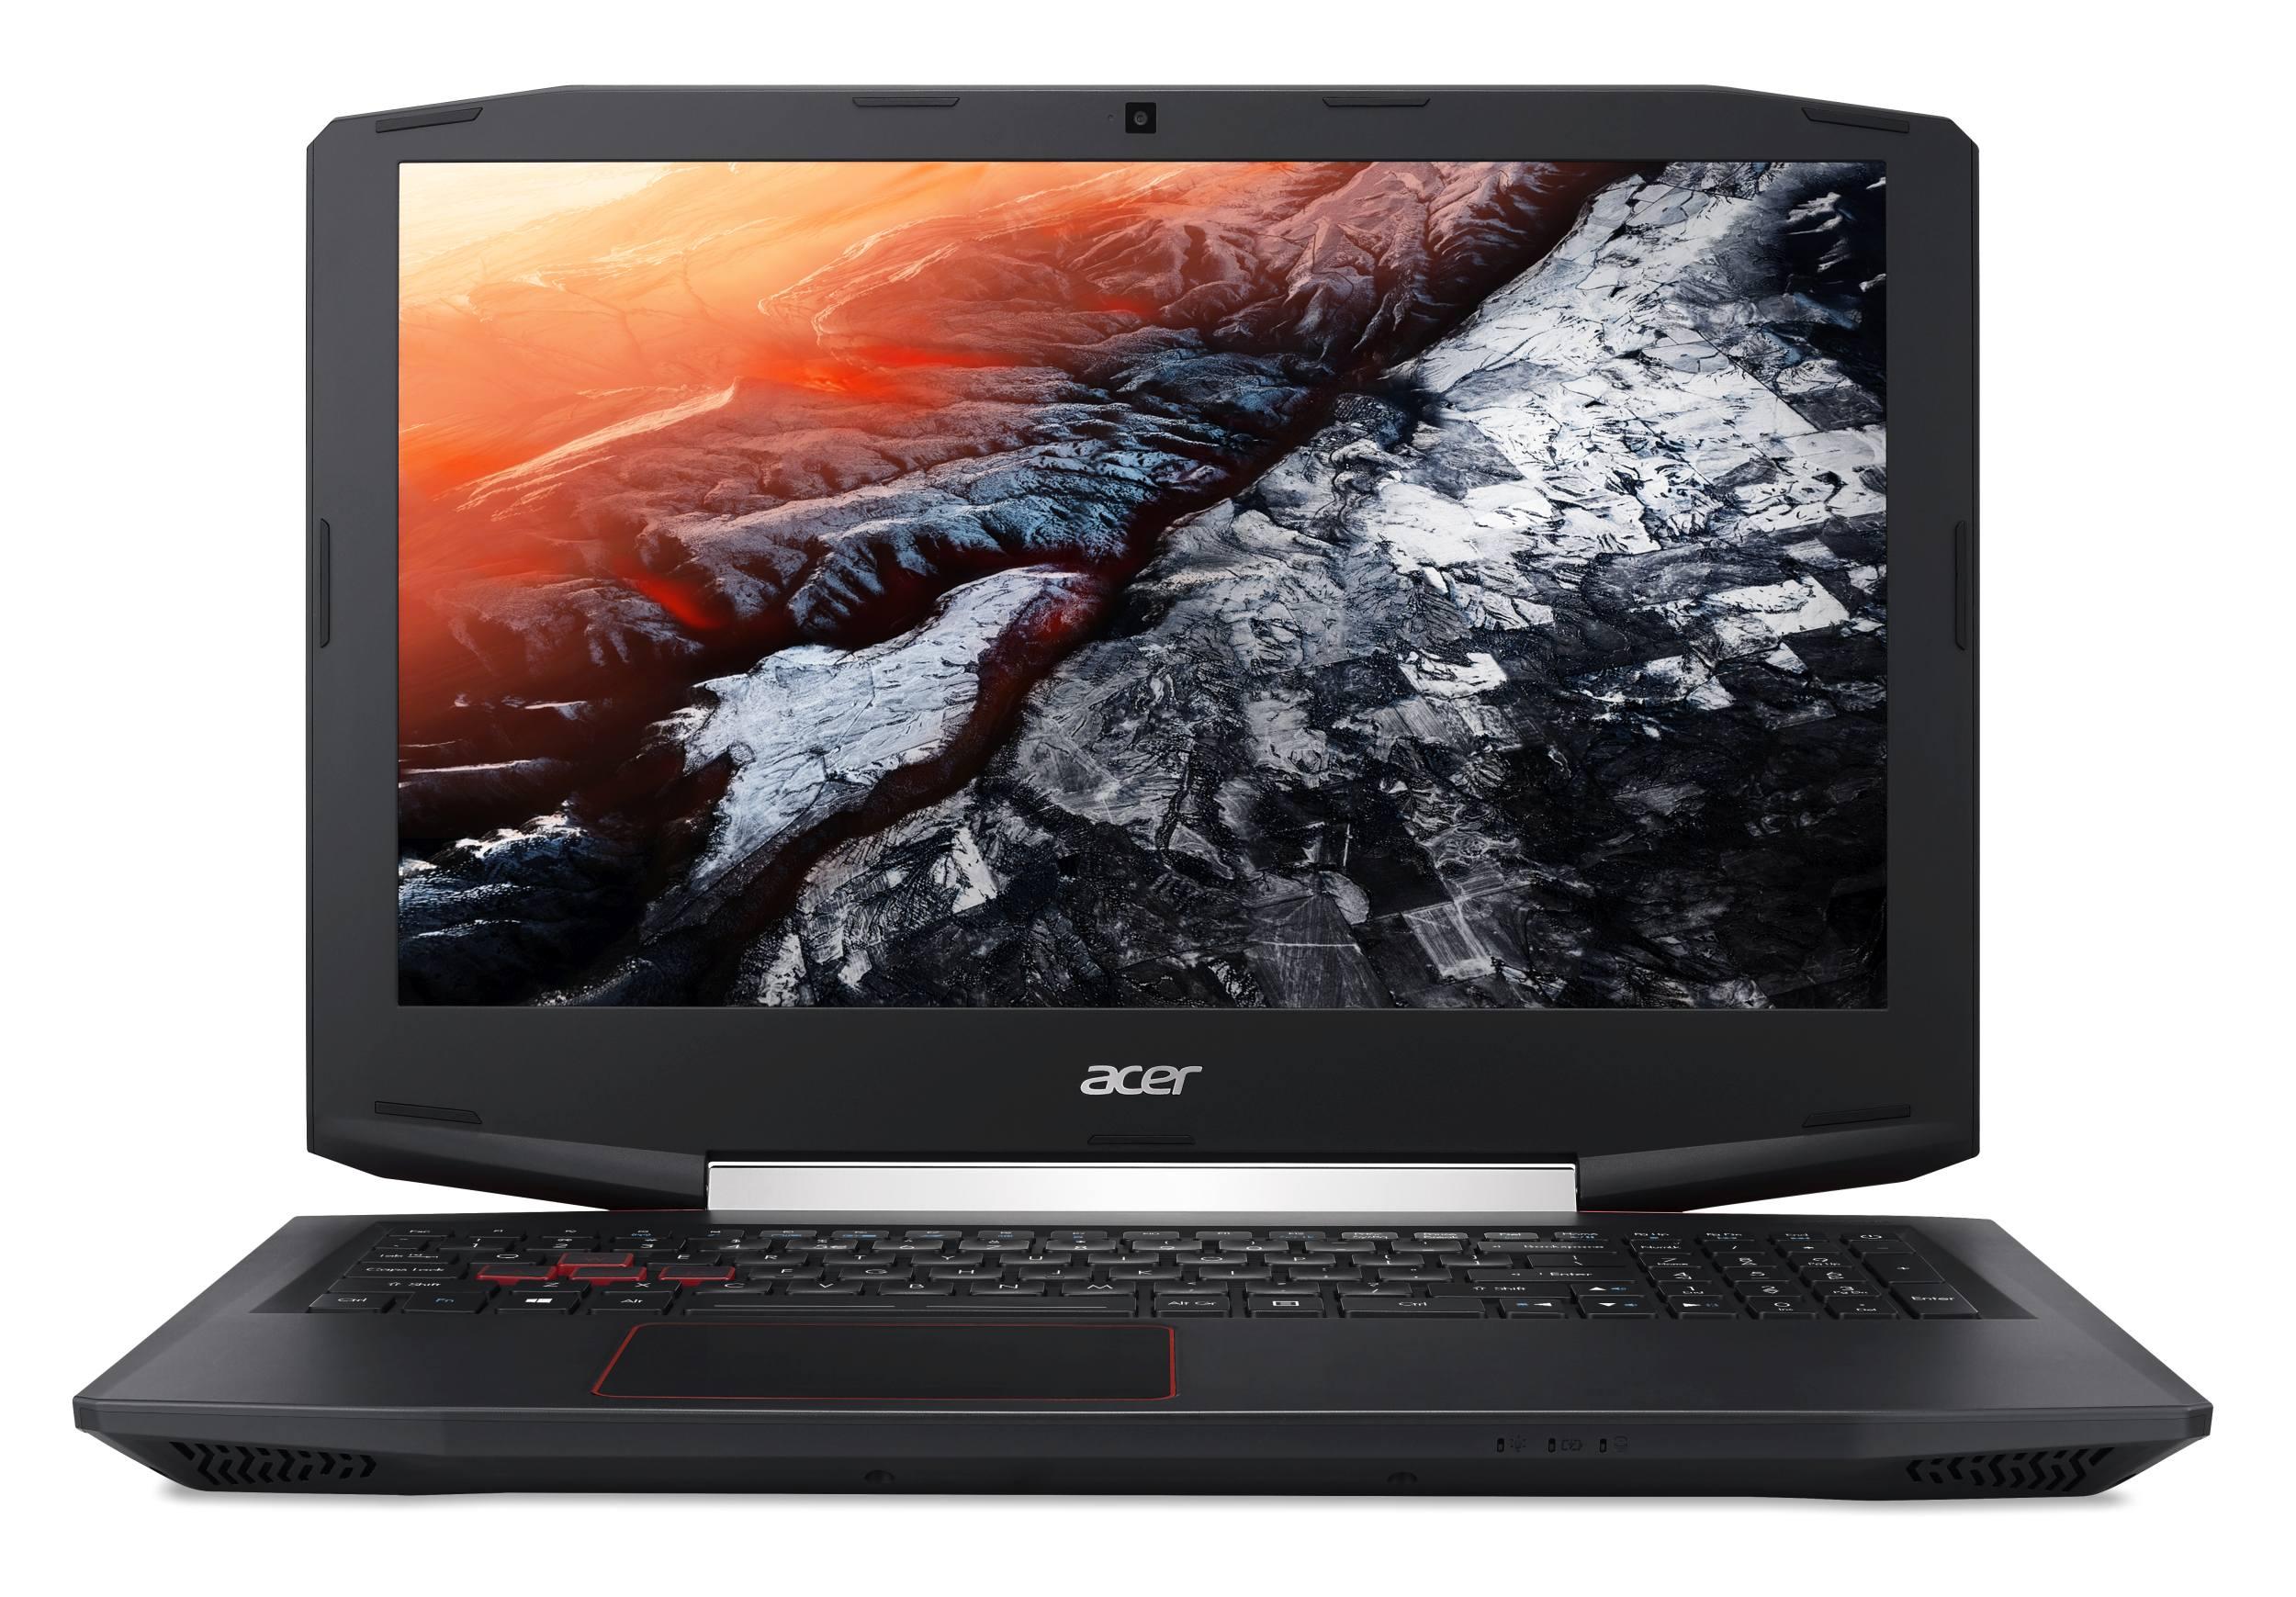 "Acer Aspire VX 15 (VX5-591G-78XG) i7-7700HQ/8GB+N/128GB SSD M.2+1T HDD/GeForceGTX1050Ti/15.6""FHD IPS LEDmat/W10H"